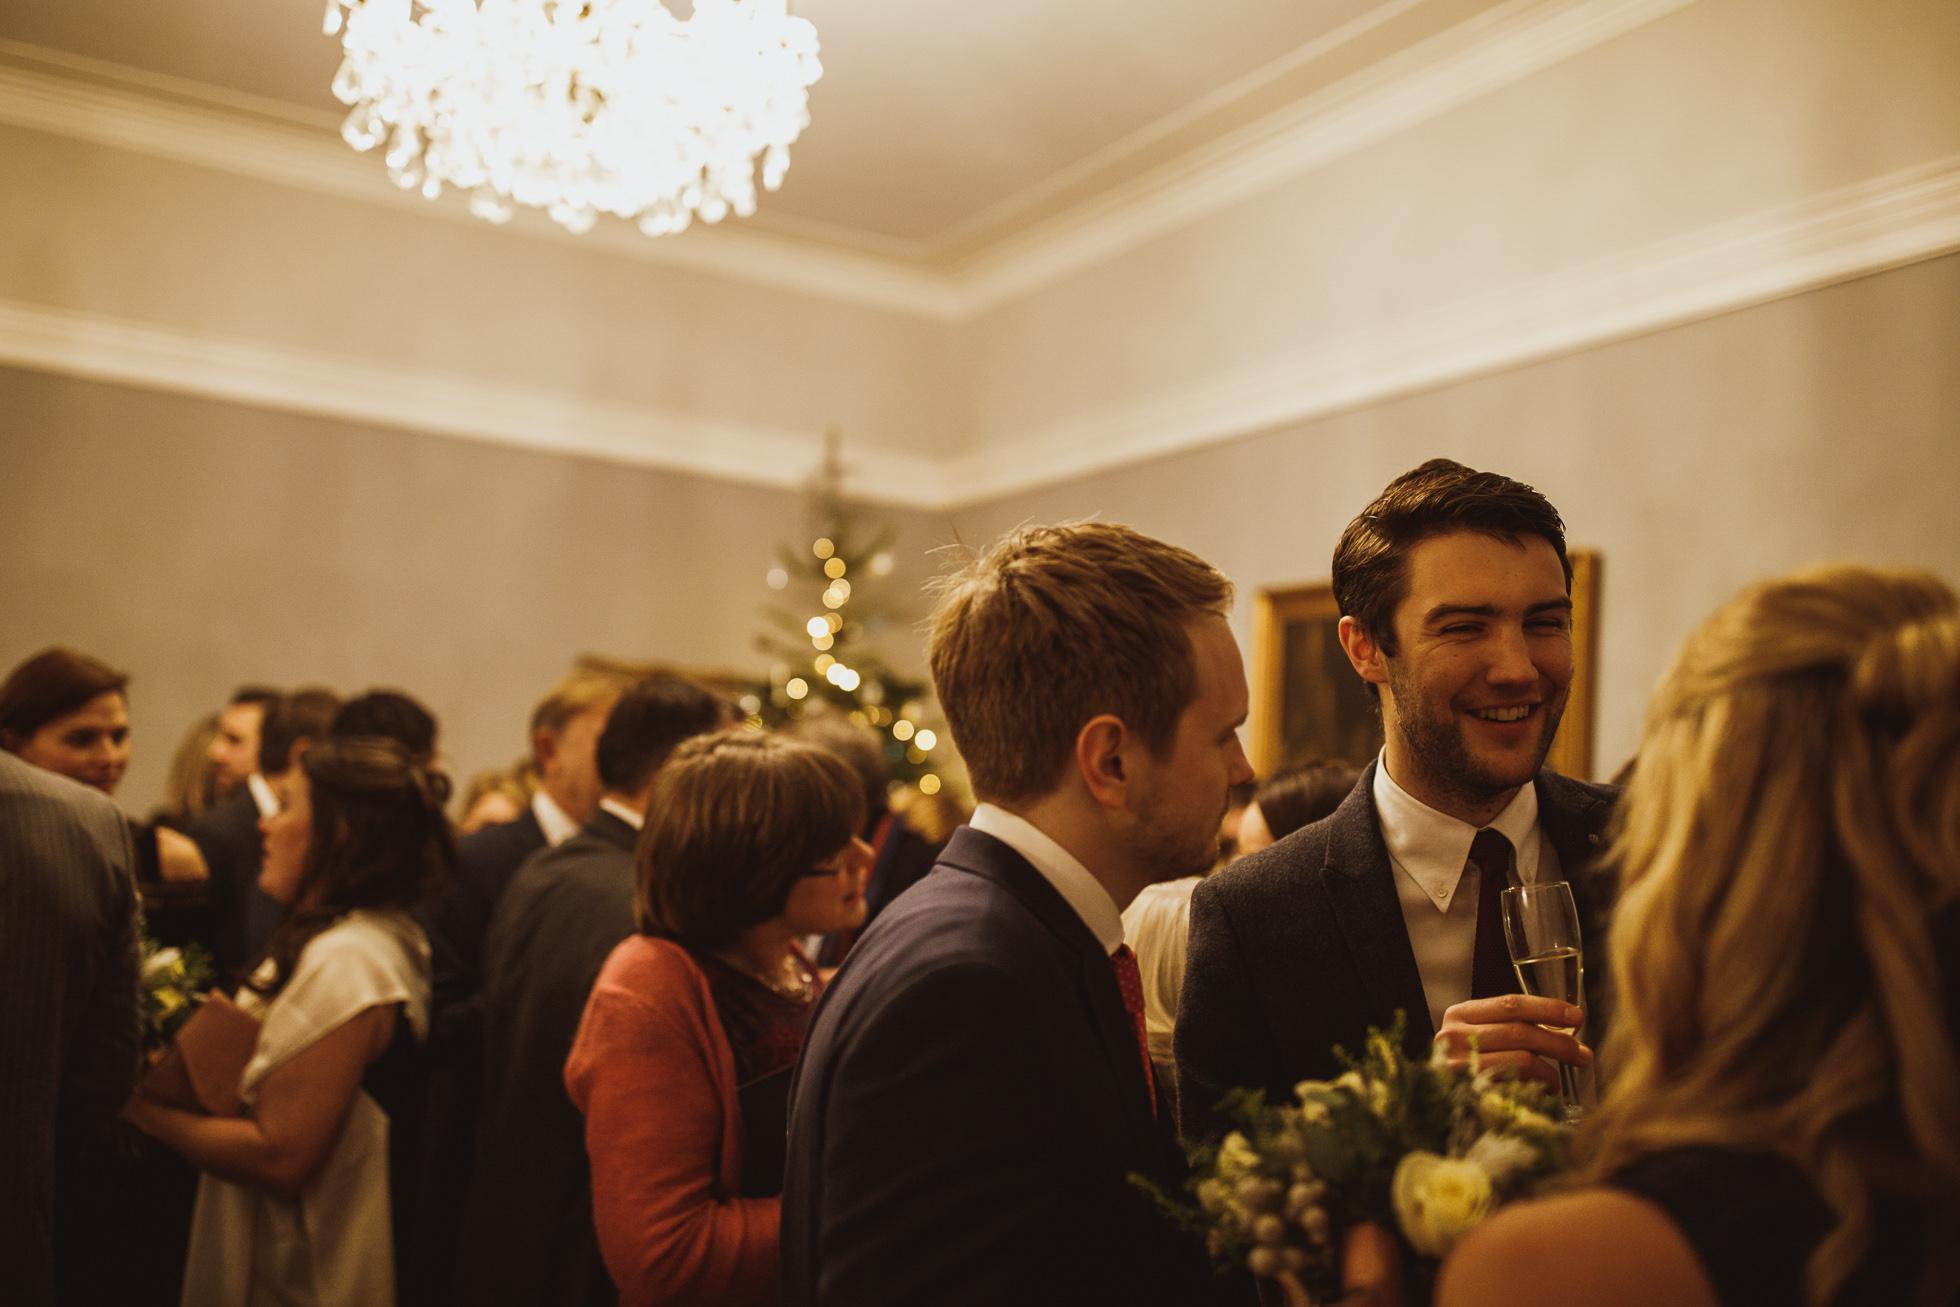 hornington_manor_wedding_photographer-72.jpg